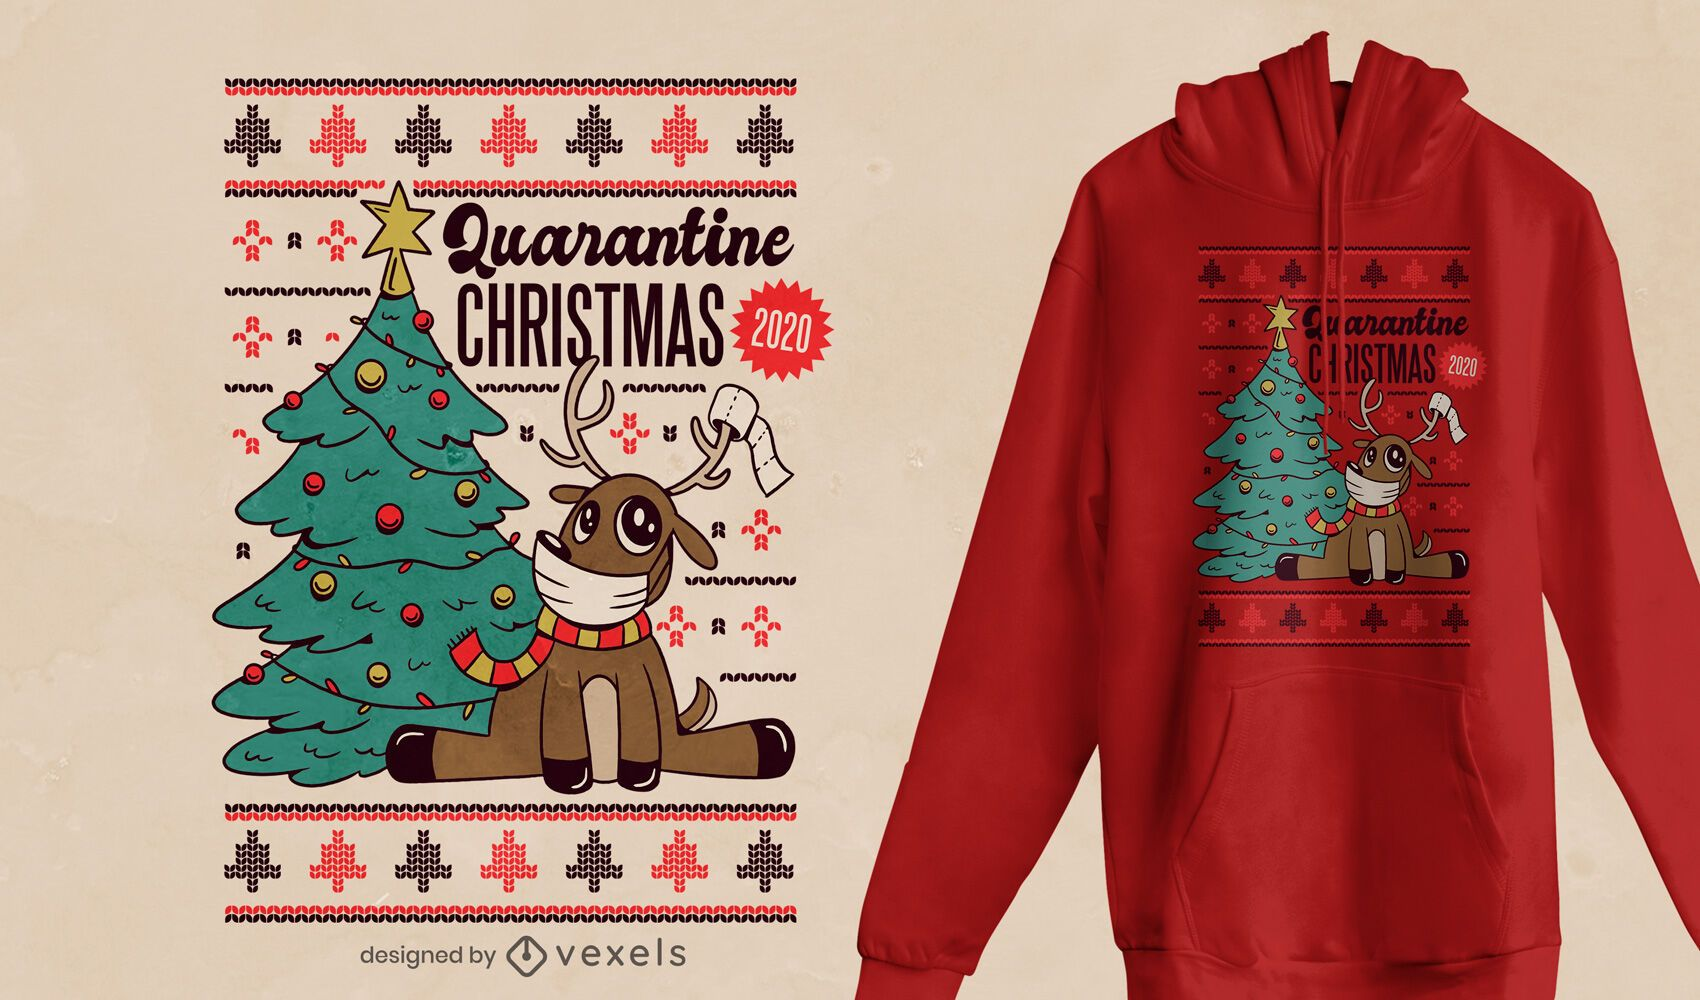 Quarantine xmas 2020 t-shirt design